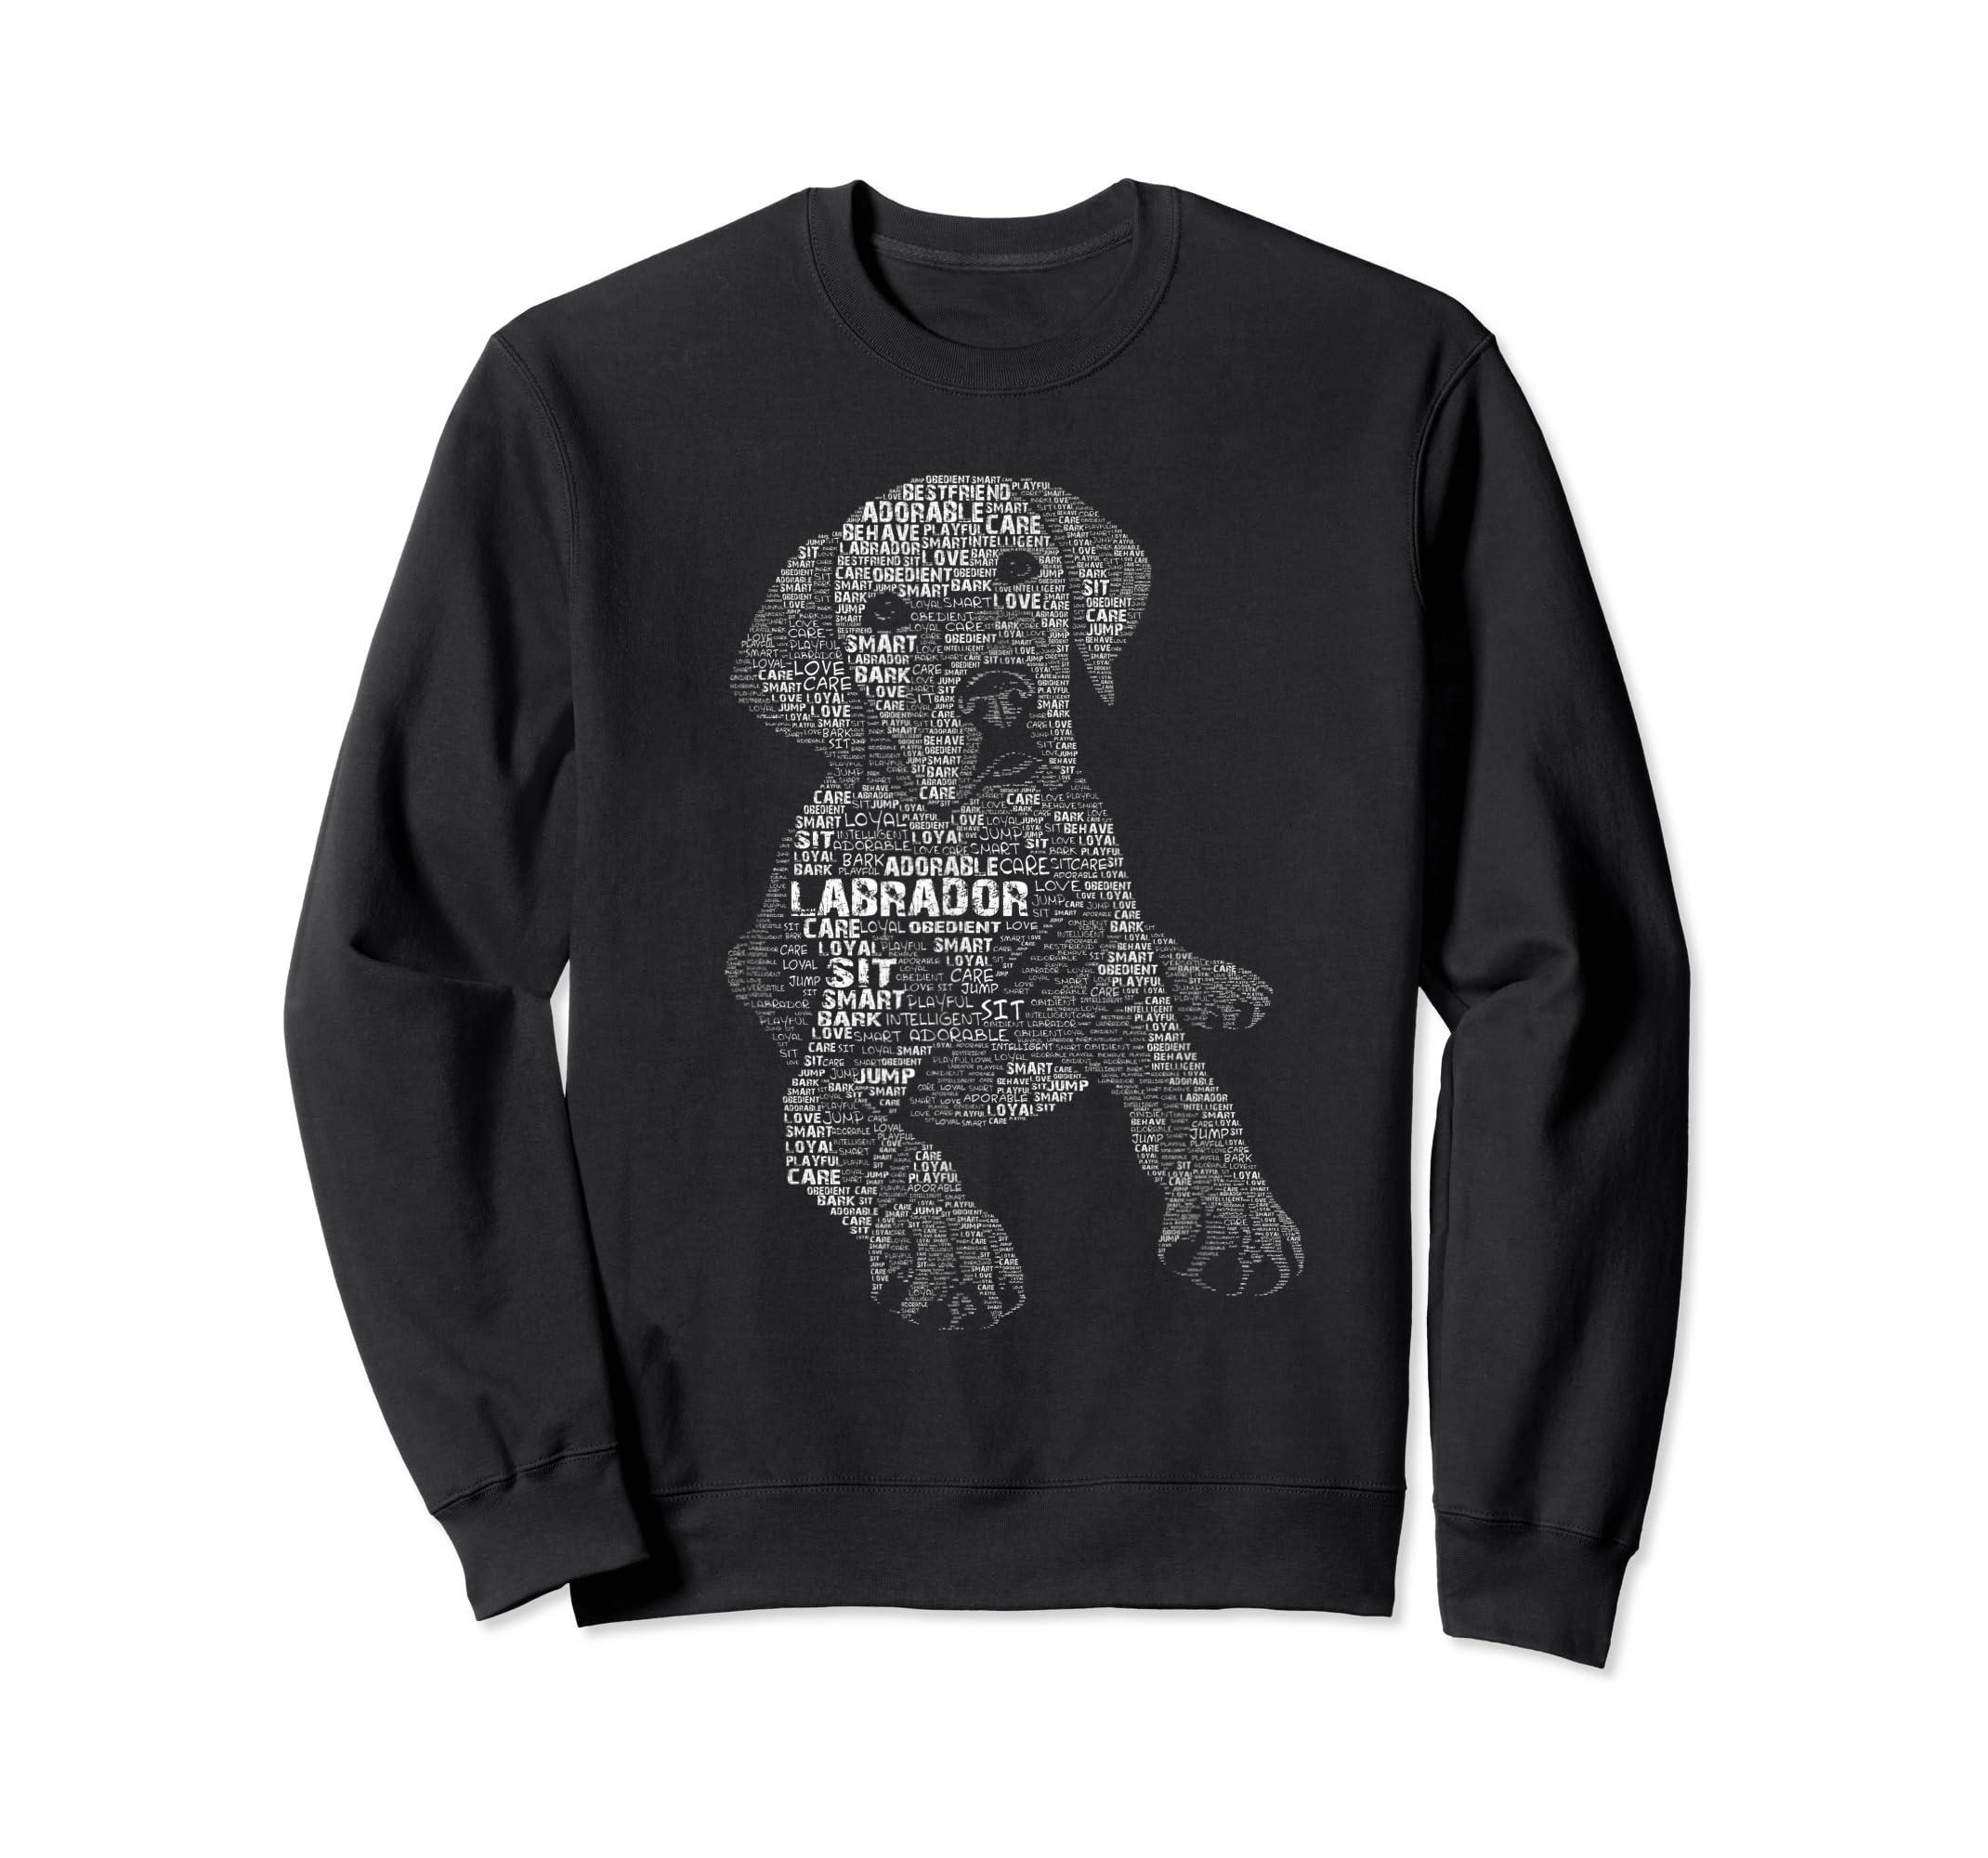 Yellow Chocolate Black Labrador Retriever - Caligram T Shirt-Sweatshirt-Black